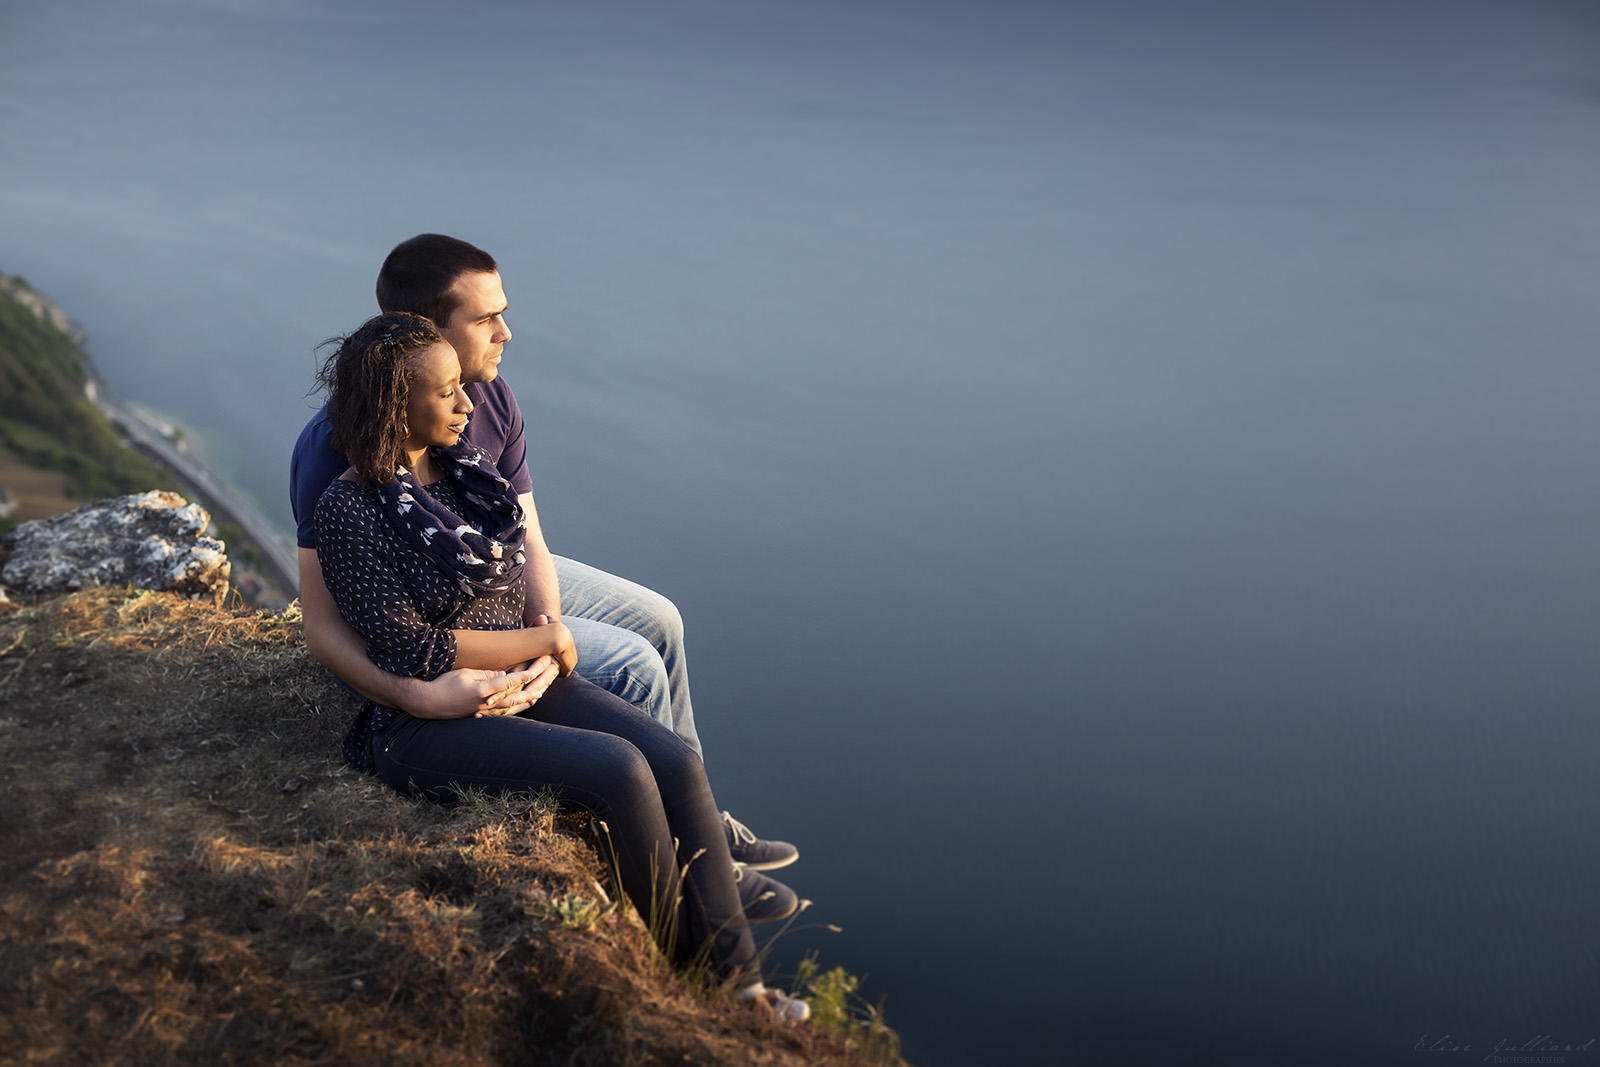 elise-julliard-photographe-lyon-rhone-alpes-mariage-amour-seance-photo-engagement-couple-love-session-wedding-lac-du-bourget-chambery-2